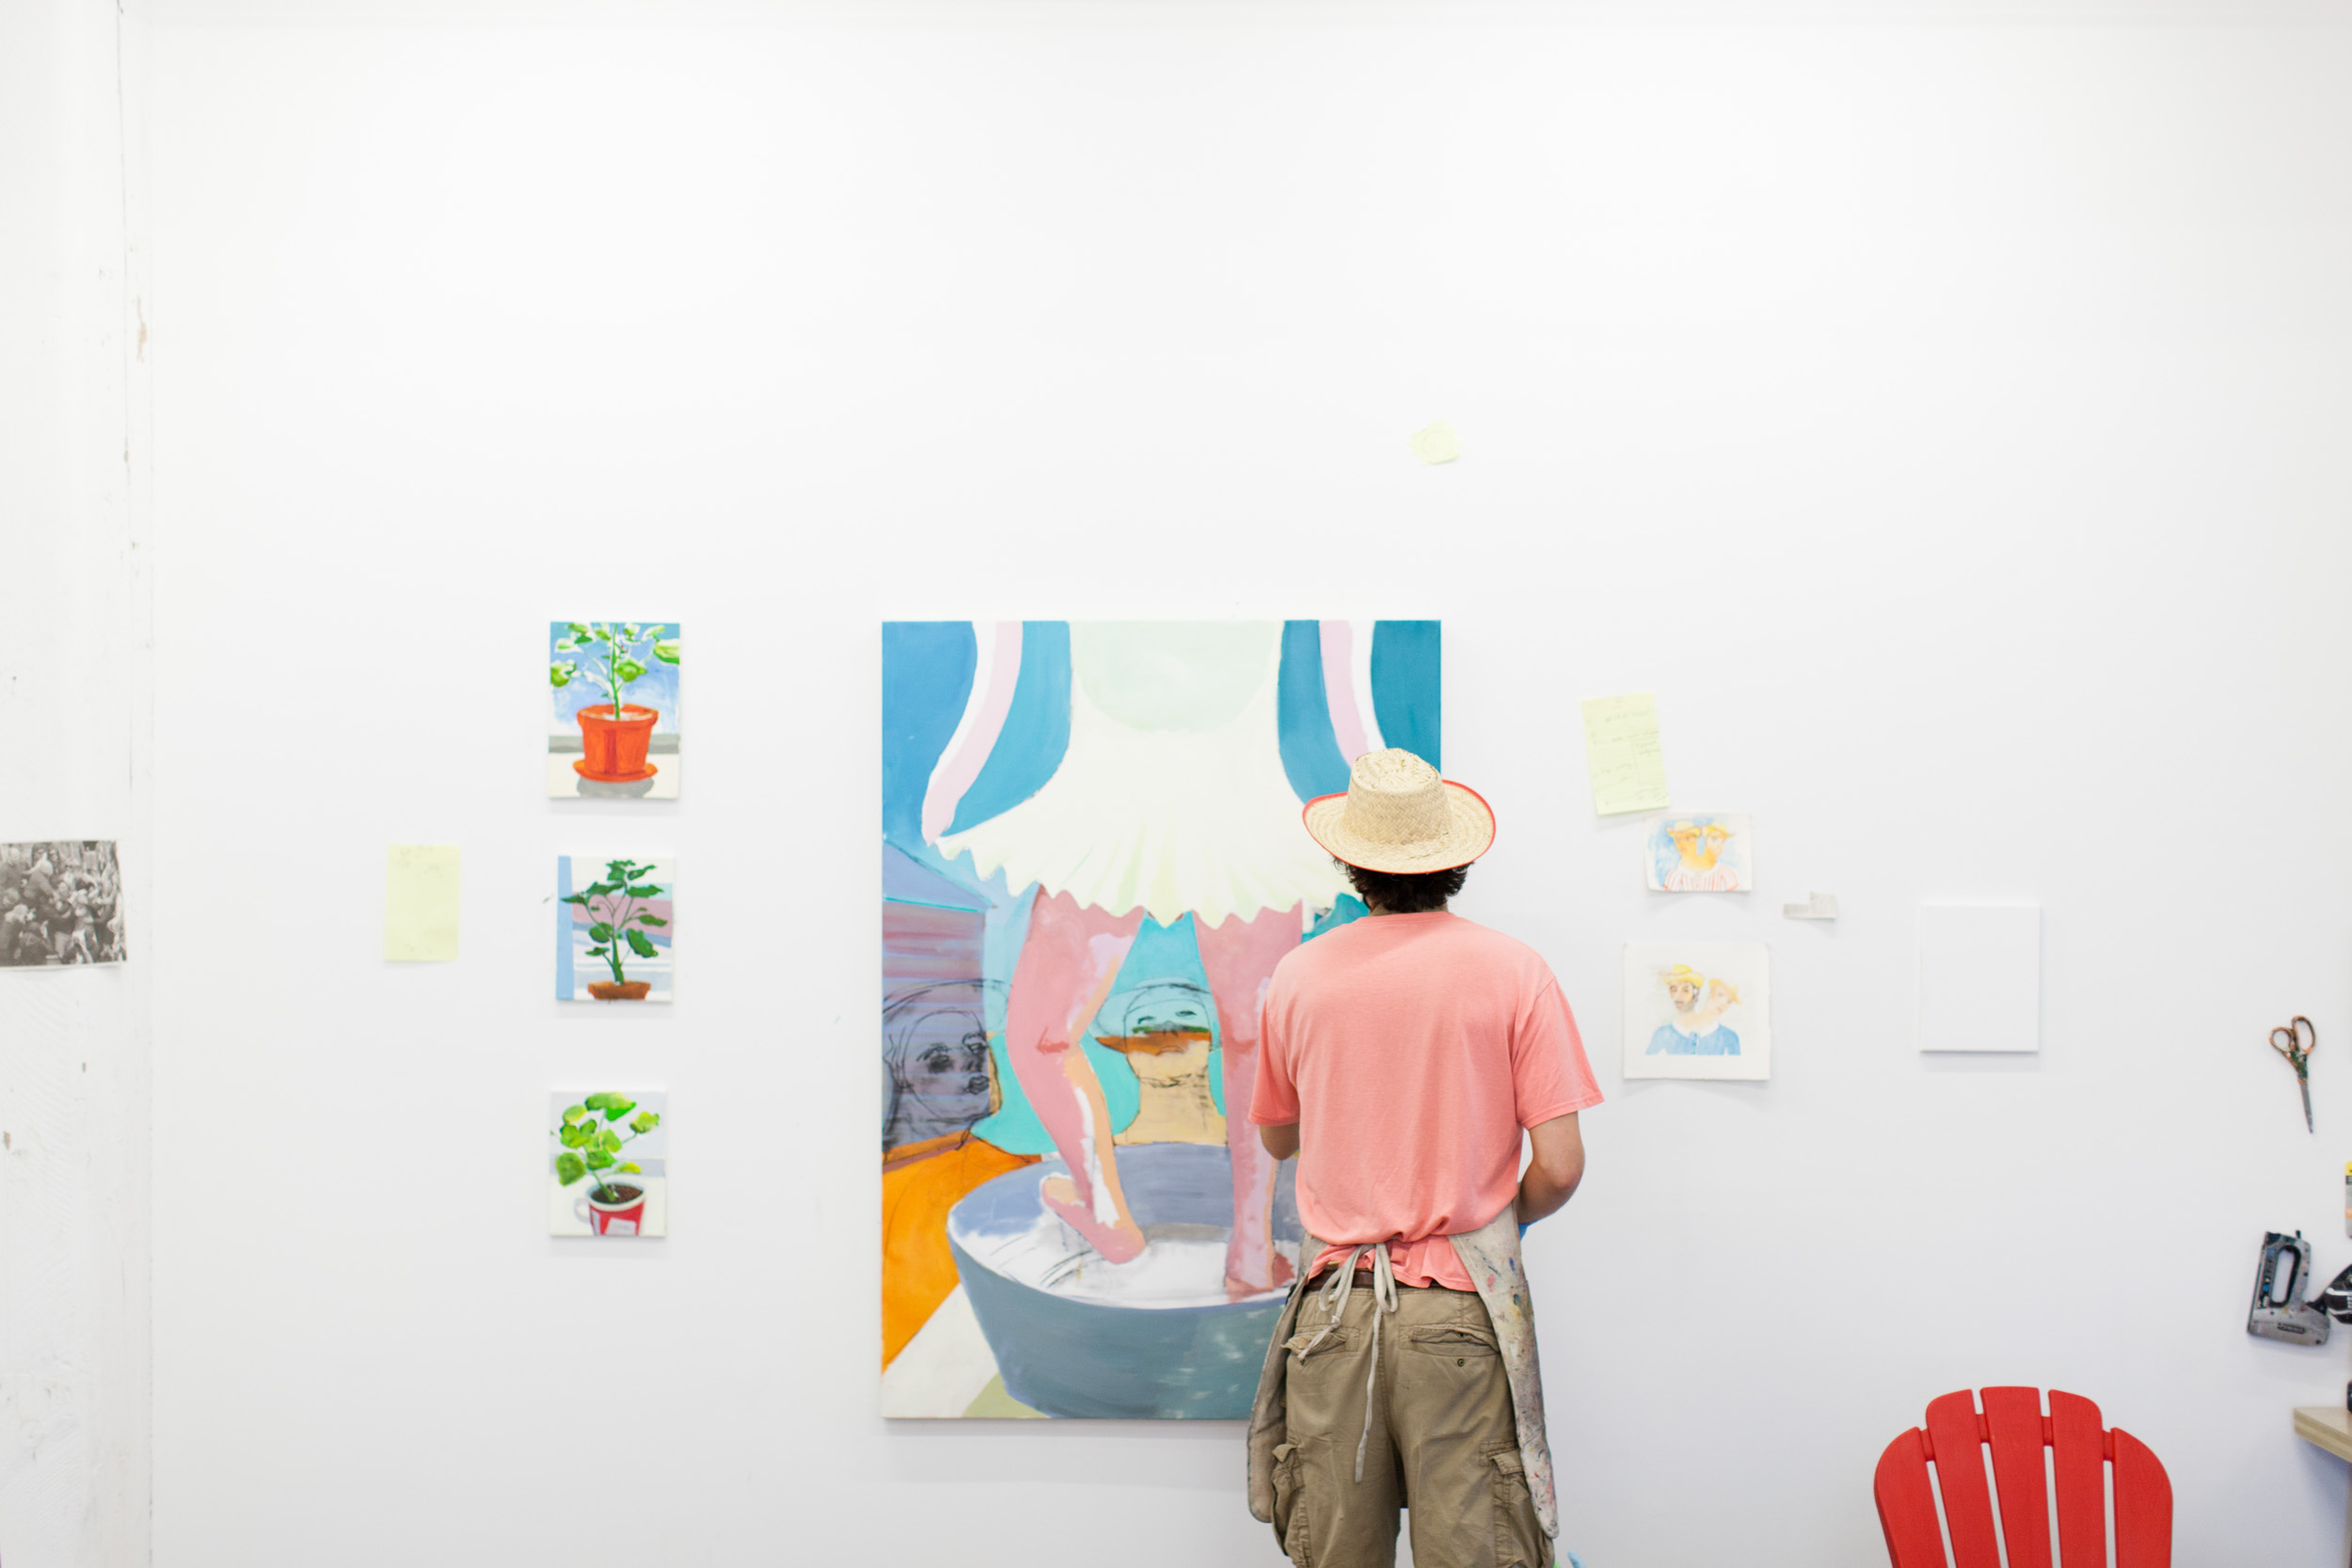 artists_043.jpg